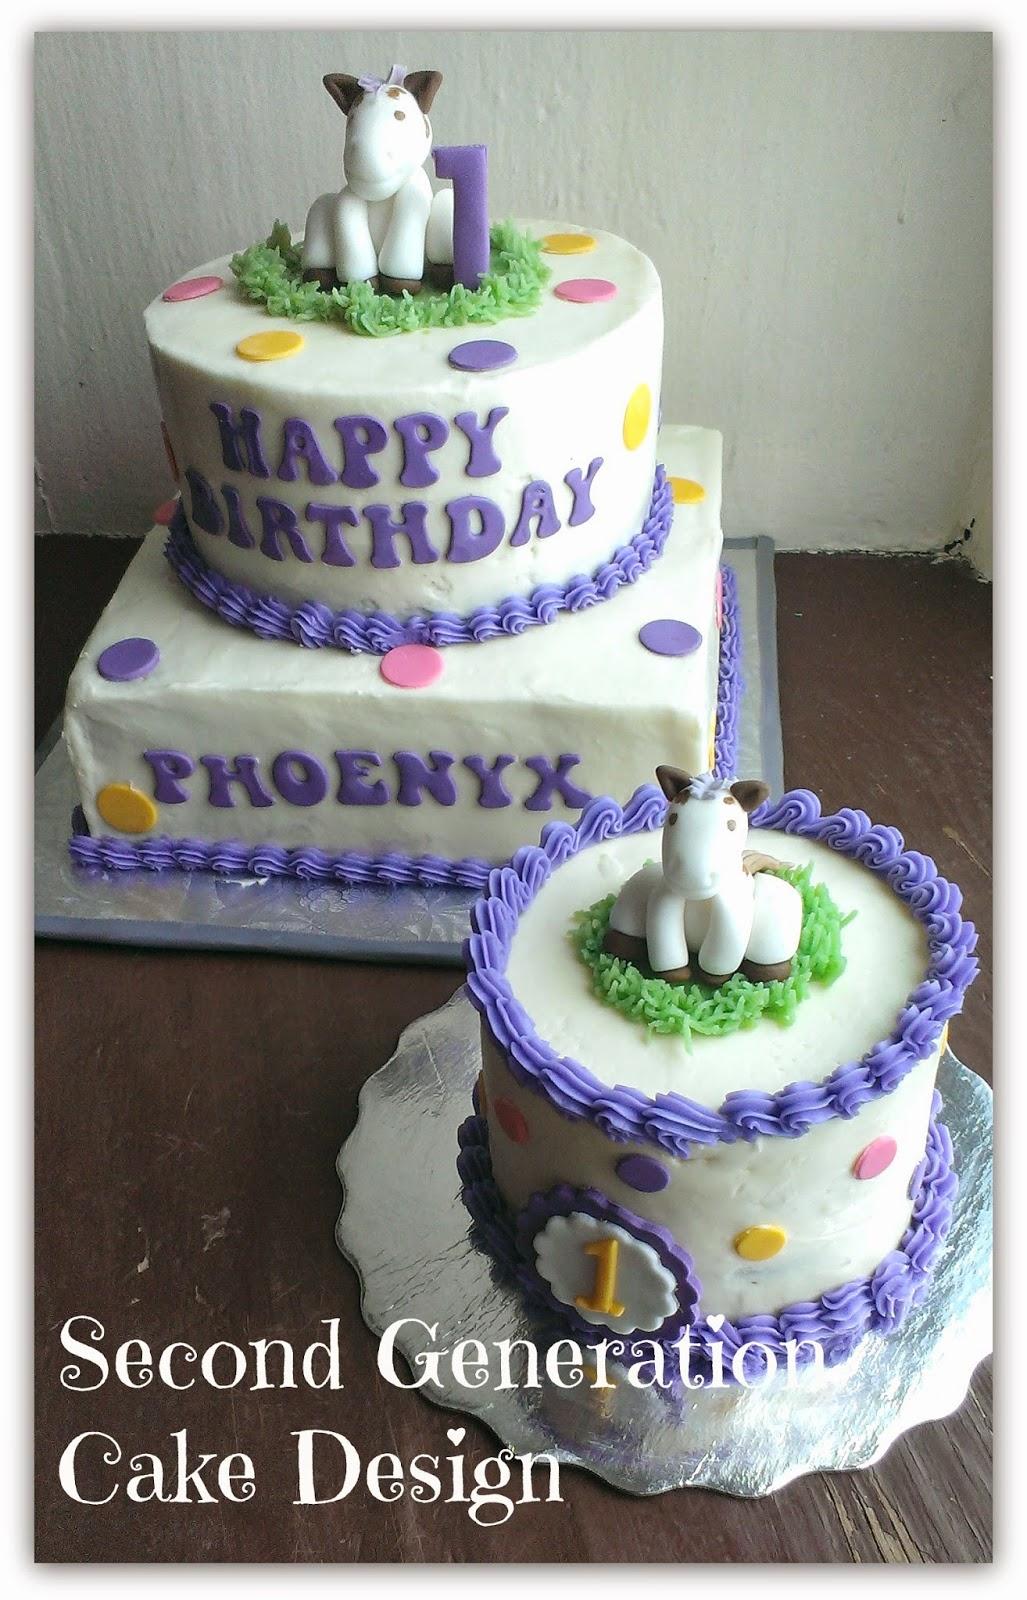 Second Generation Cake Design Horse Themed 1st Birthday Cake